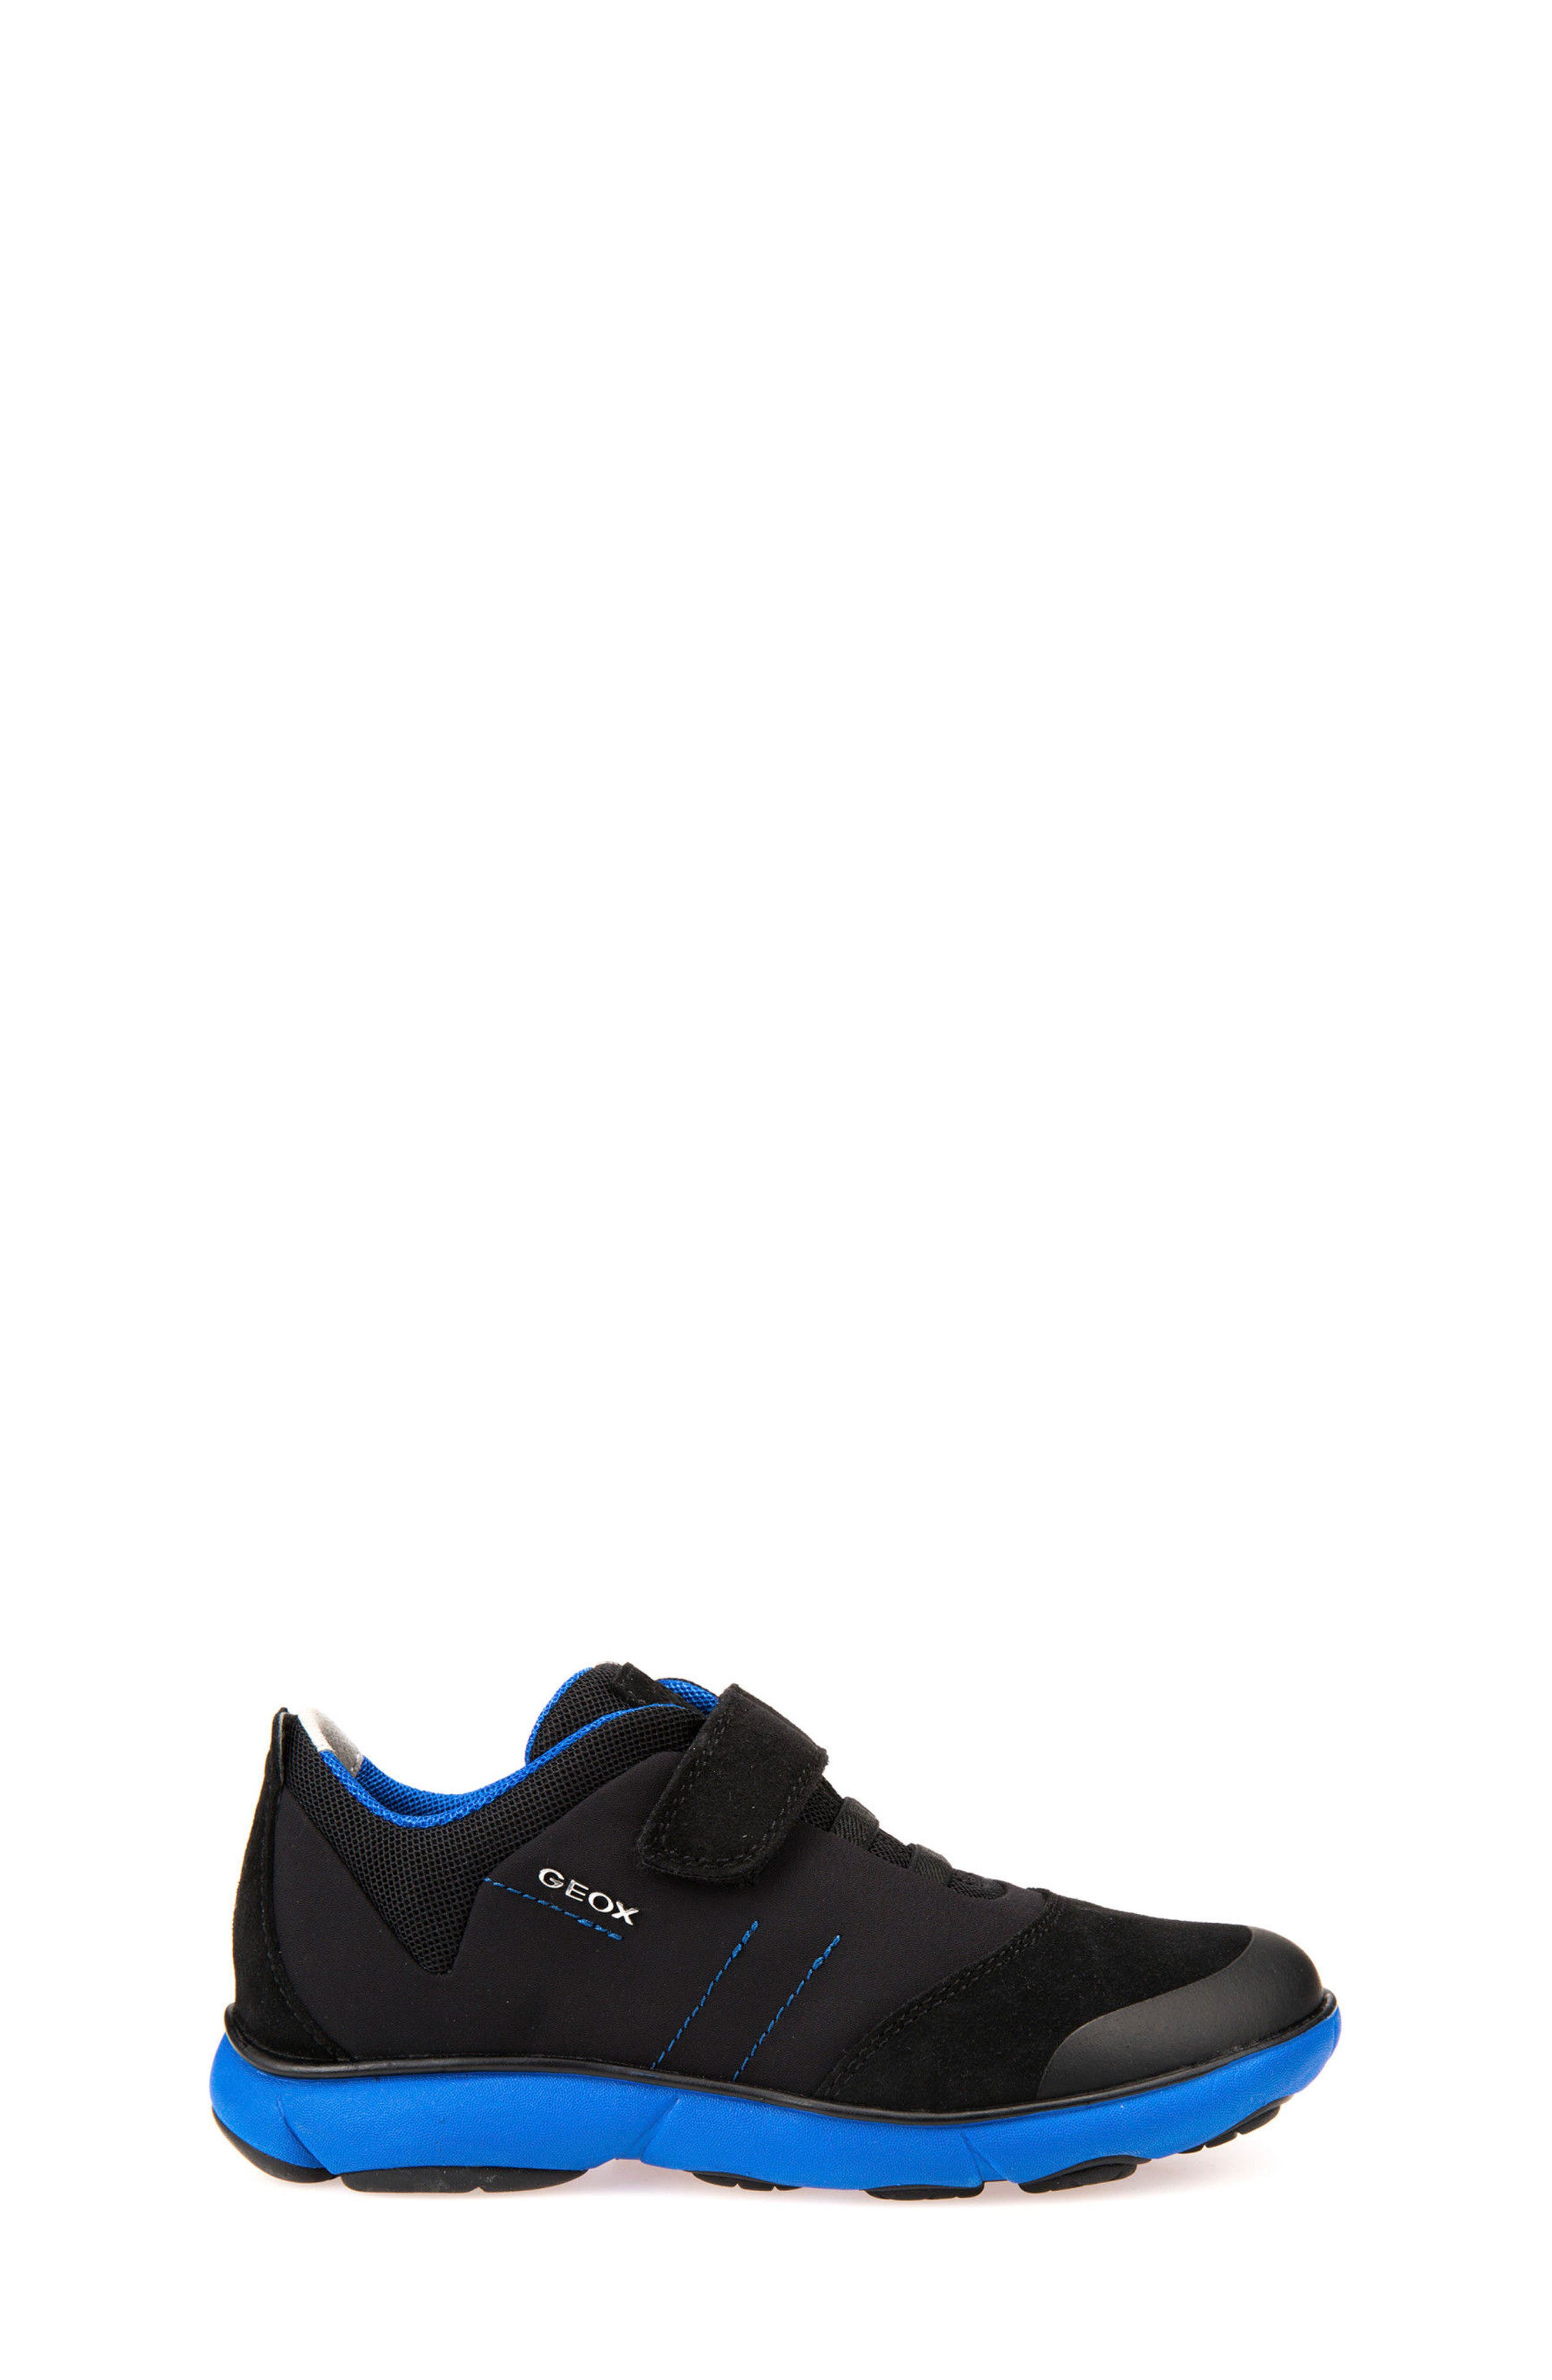 Alternate Image 3  - Geox Nebula Low Top Sneaker (Toddler, Little Kid & Big Kid)